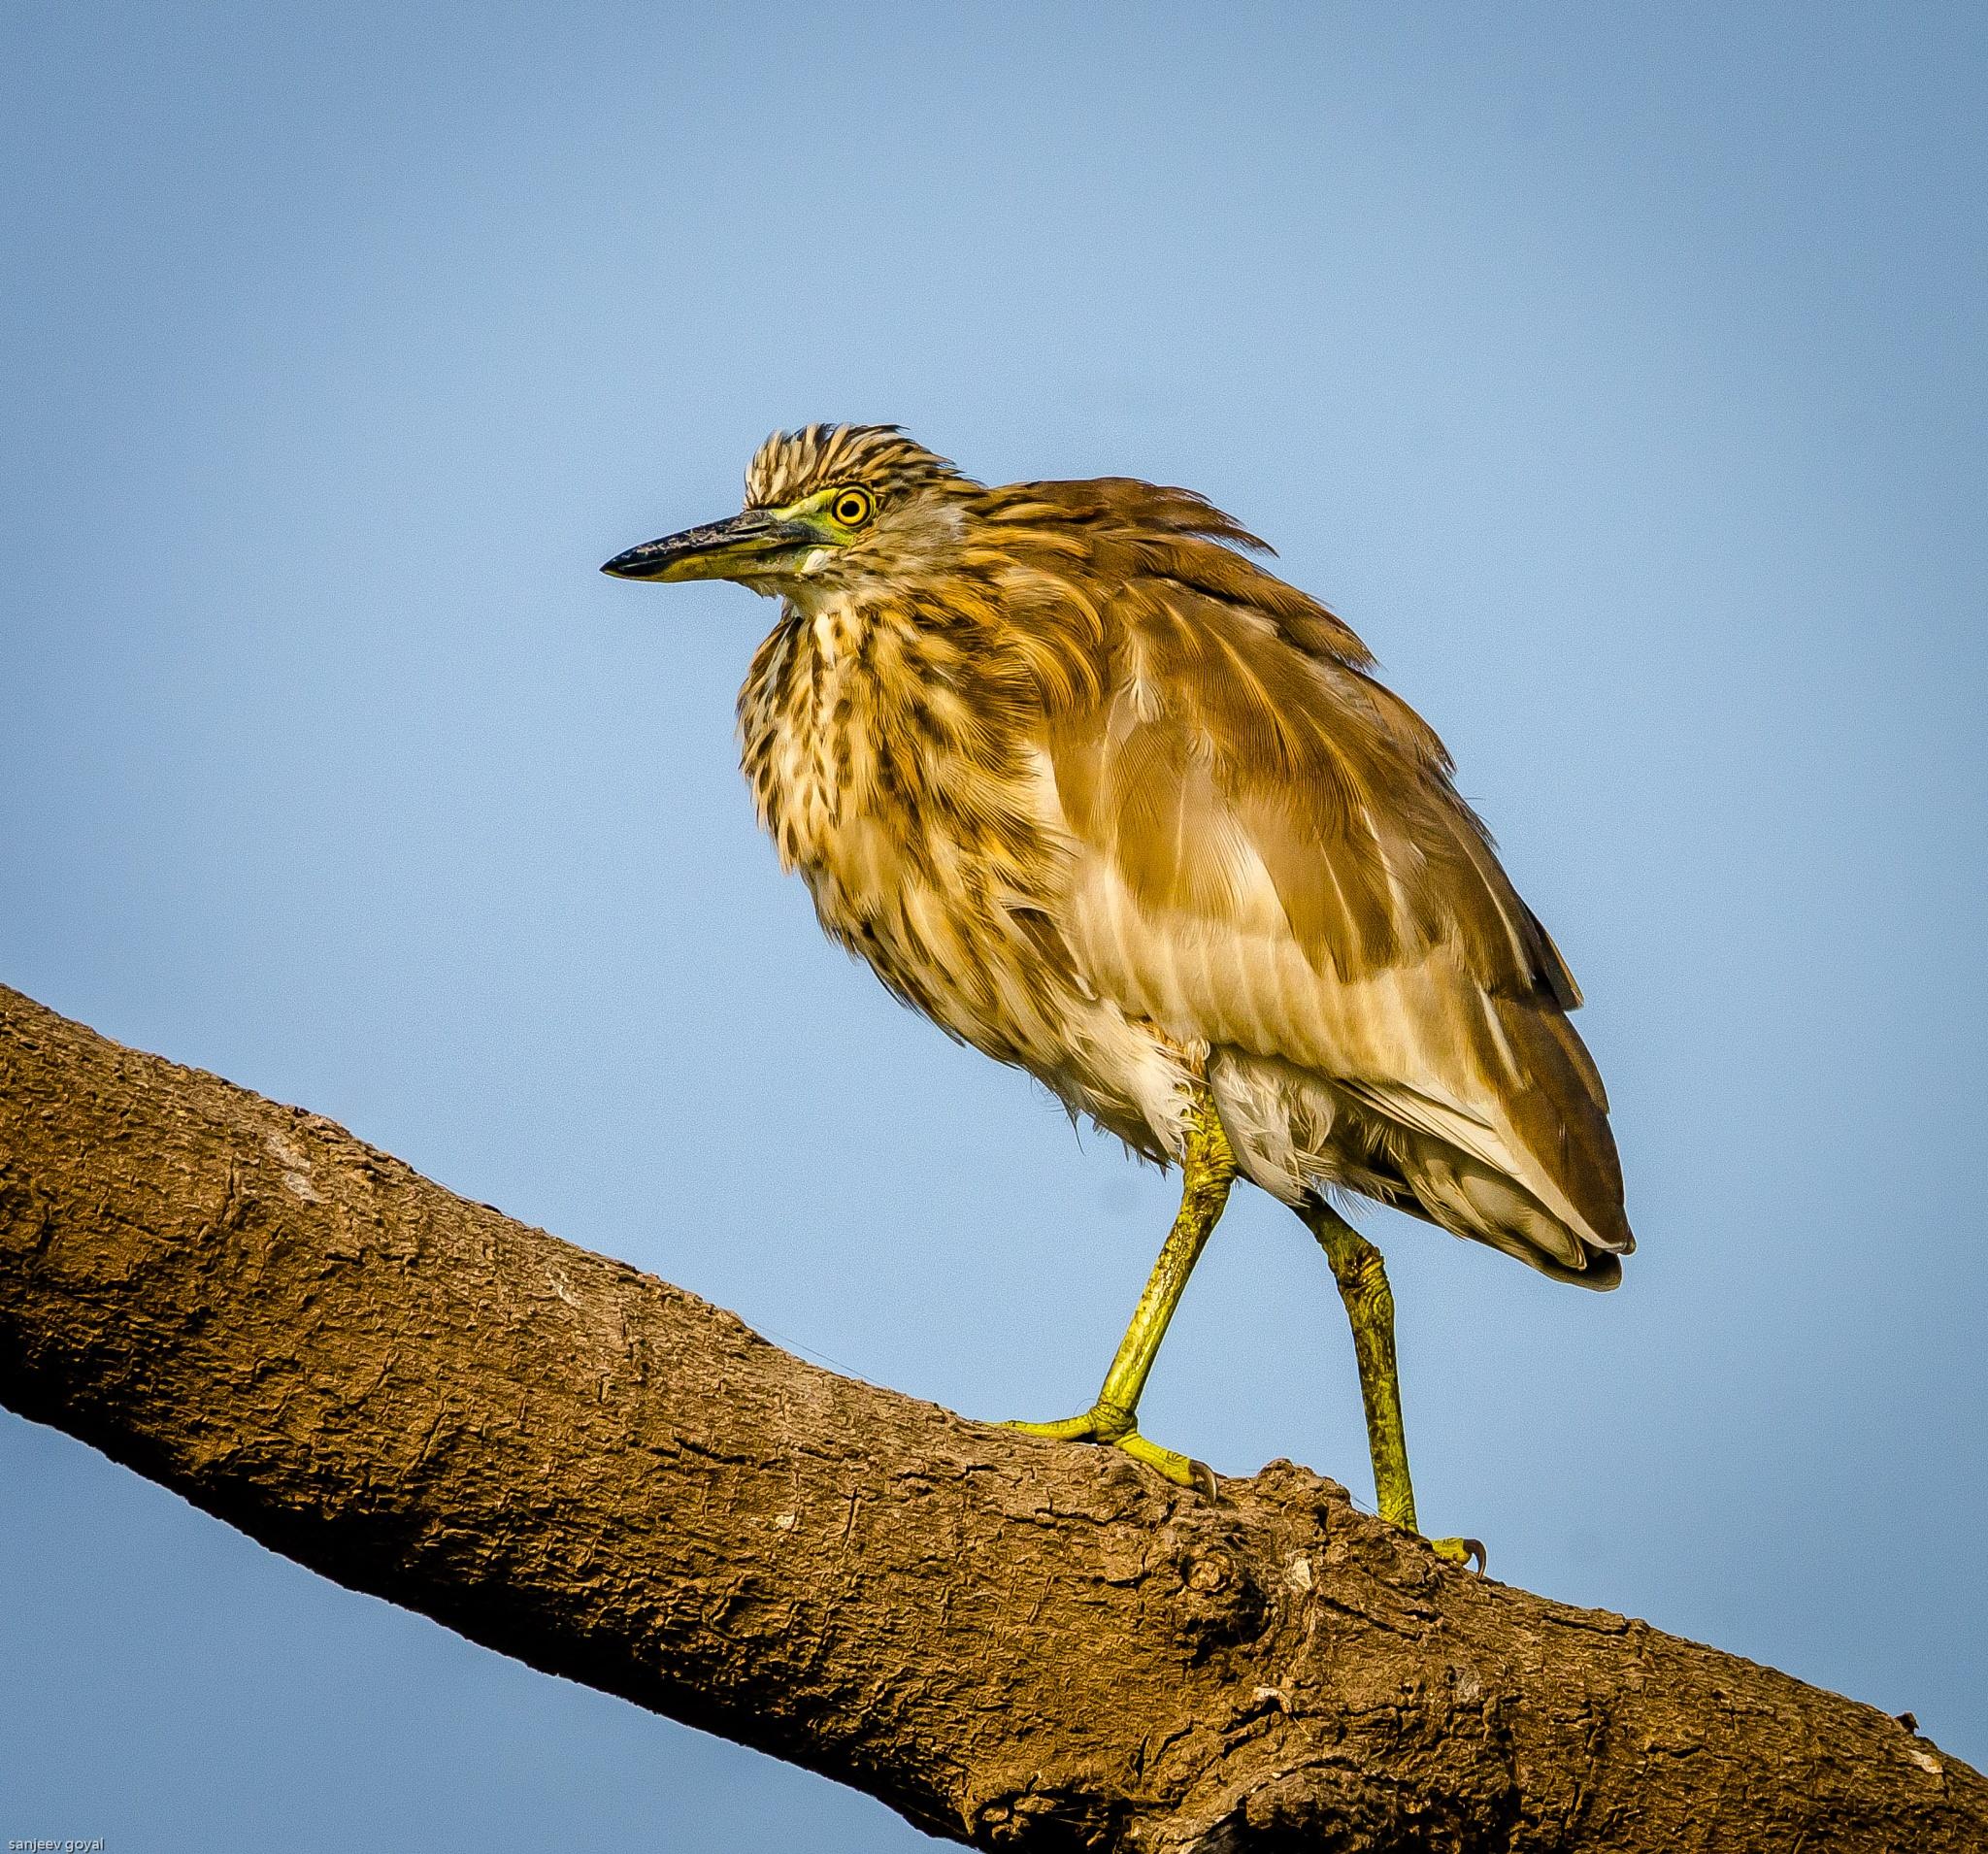 Pond Heron by sanjeev.k.goyal.10